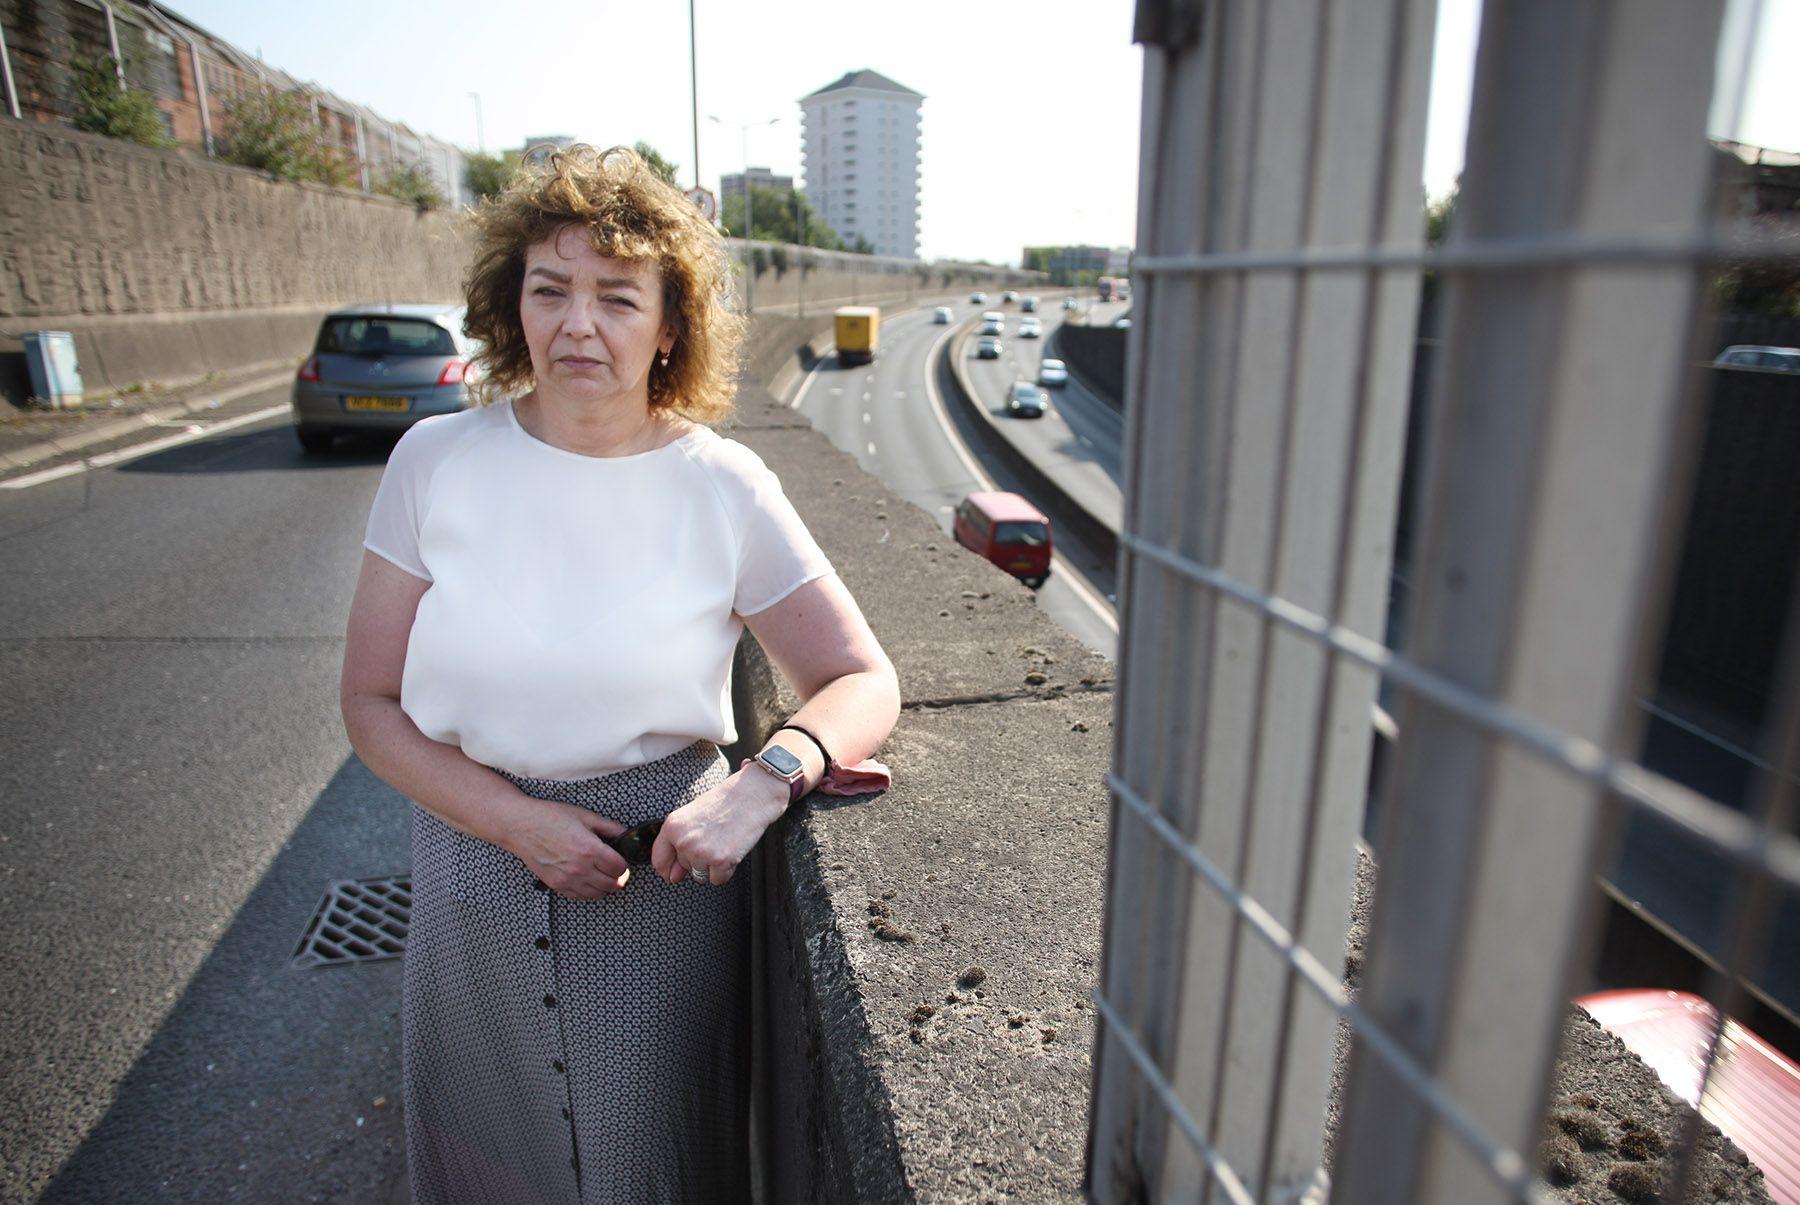 WELCOME PROGRESS: North Belfast Sinn Féin MLA Carál Ní Chuilín at a Westlink bridge